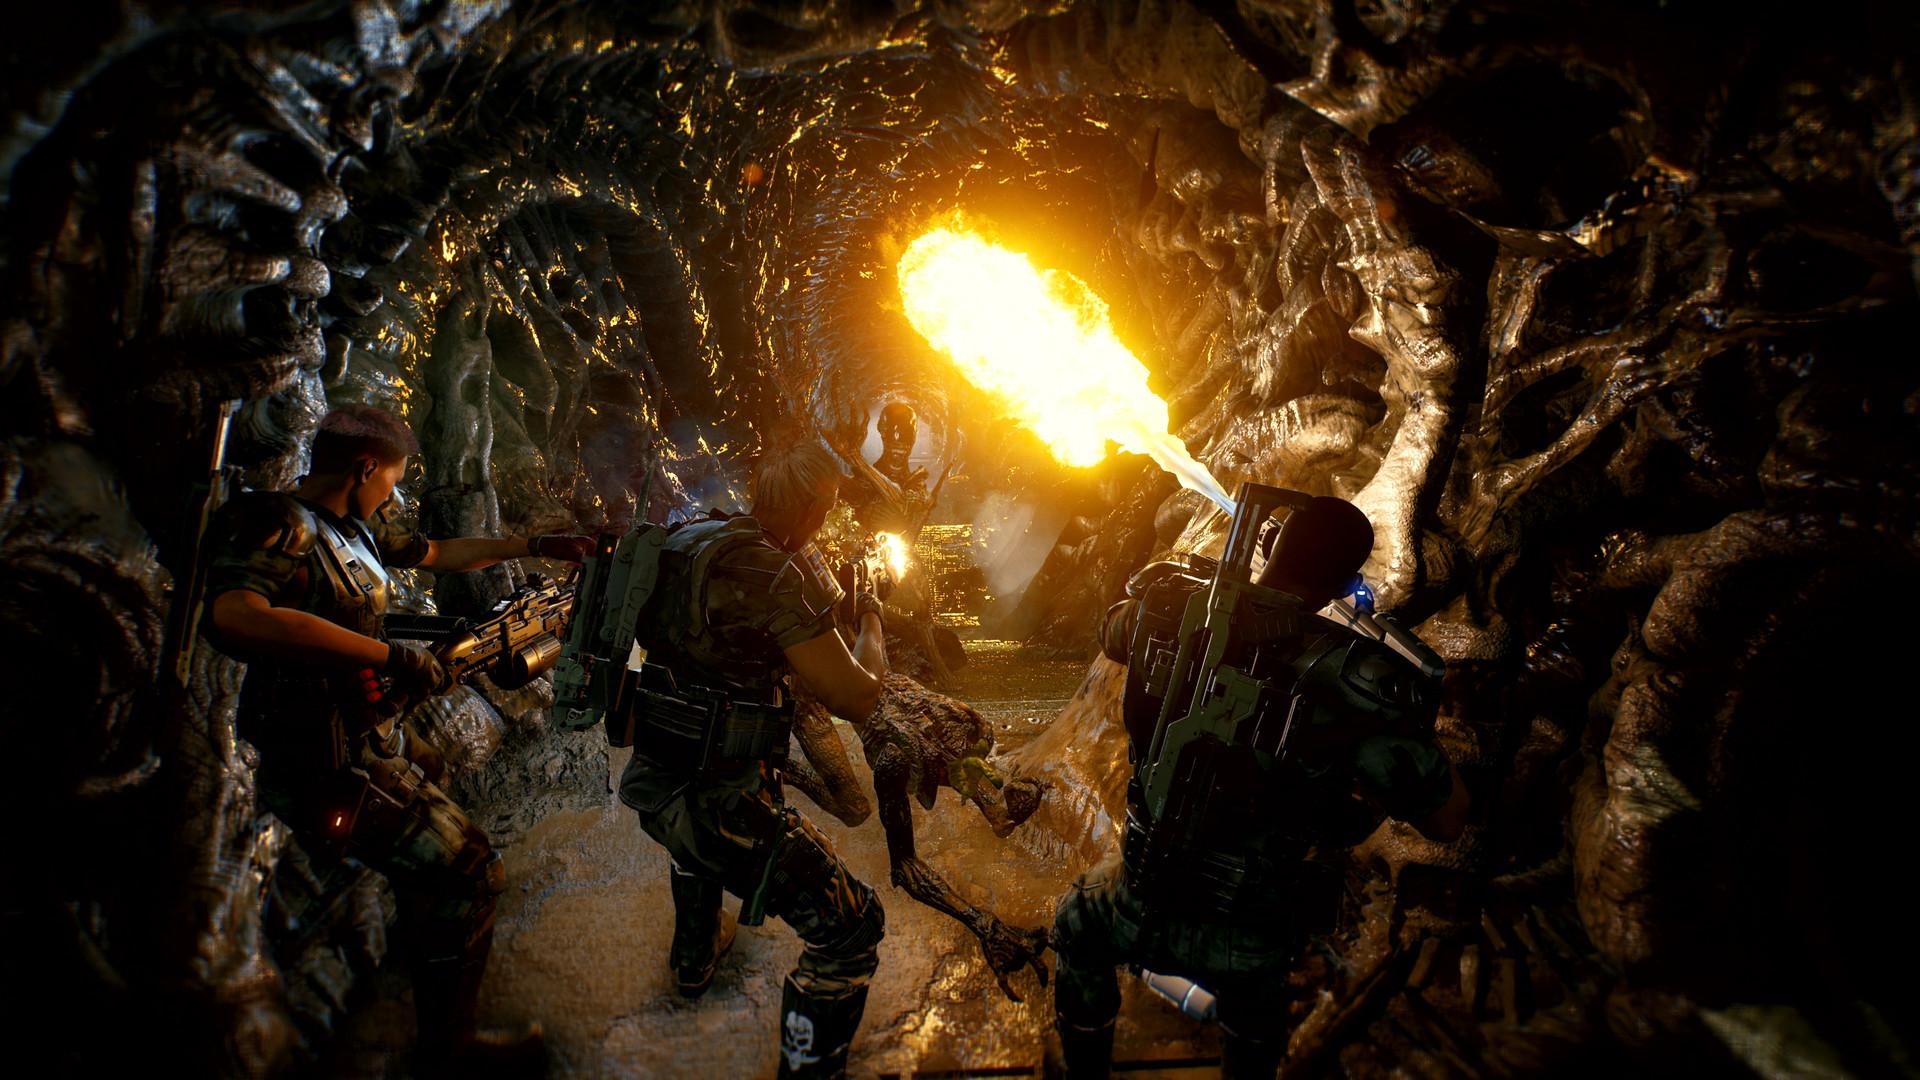 Aliens: Fireteam Elite Exploration Hidden Class Guide - How To Unlock & Play